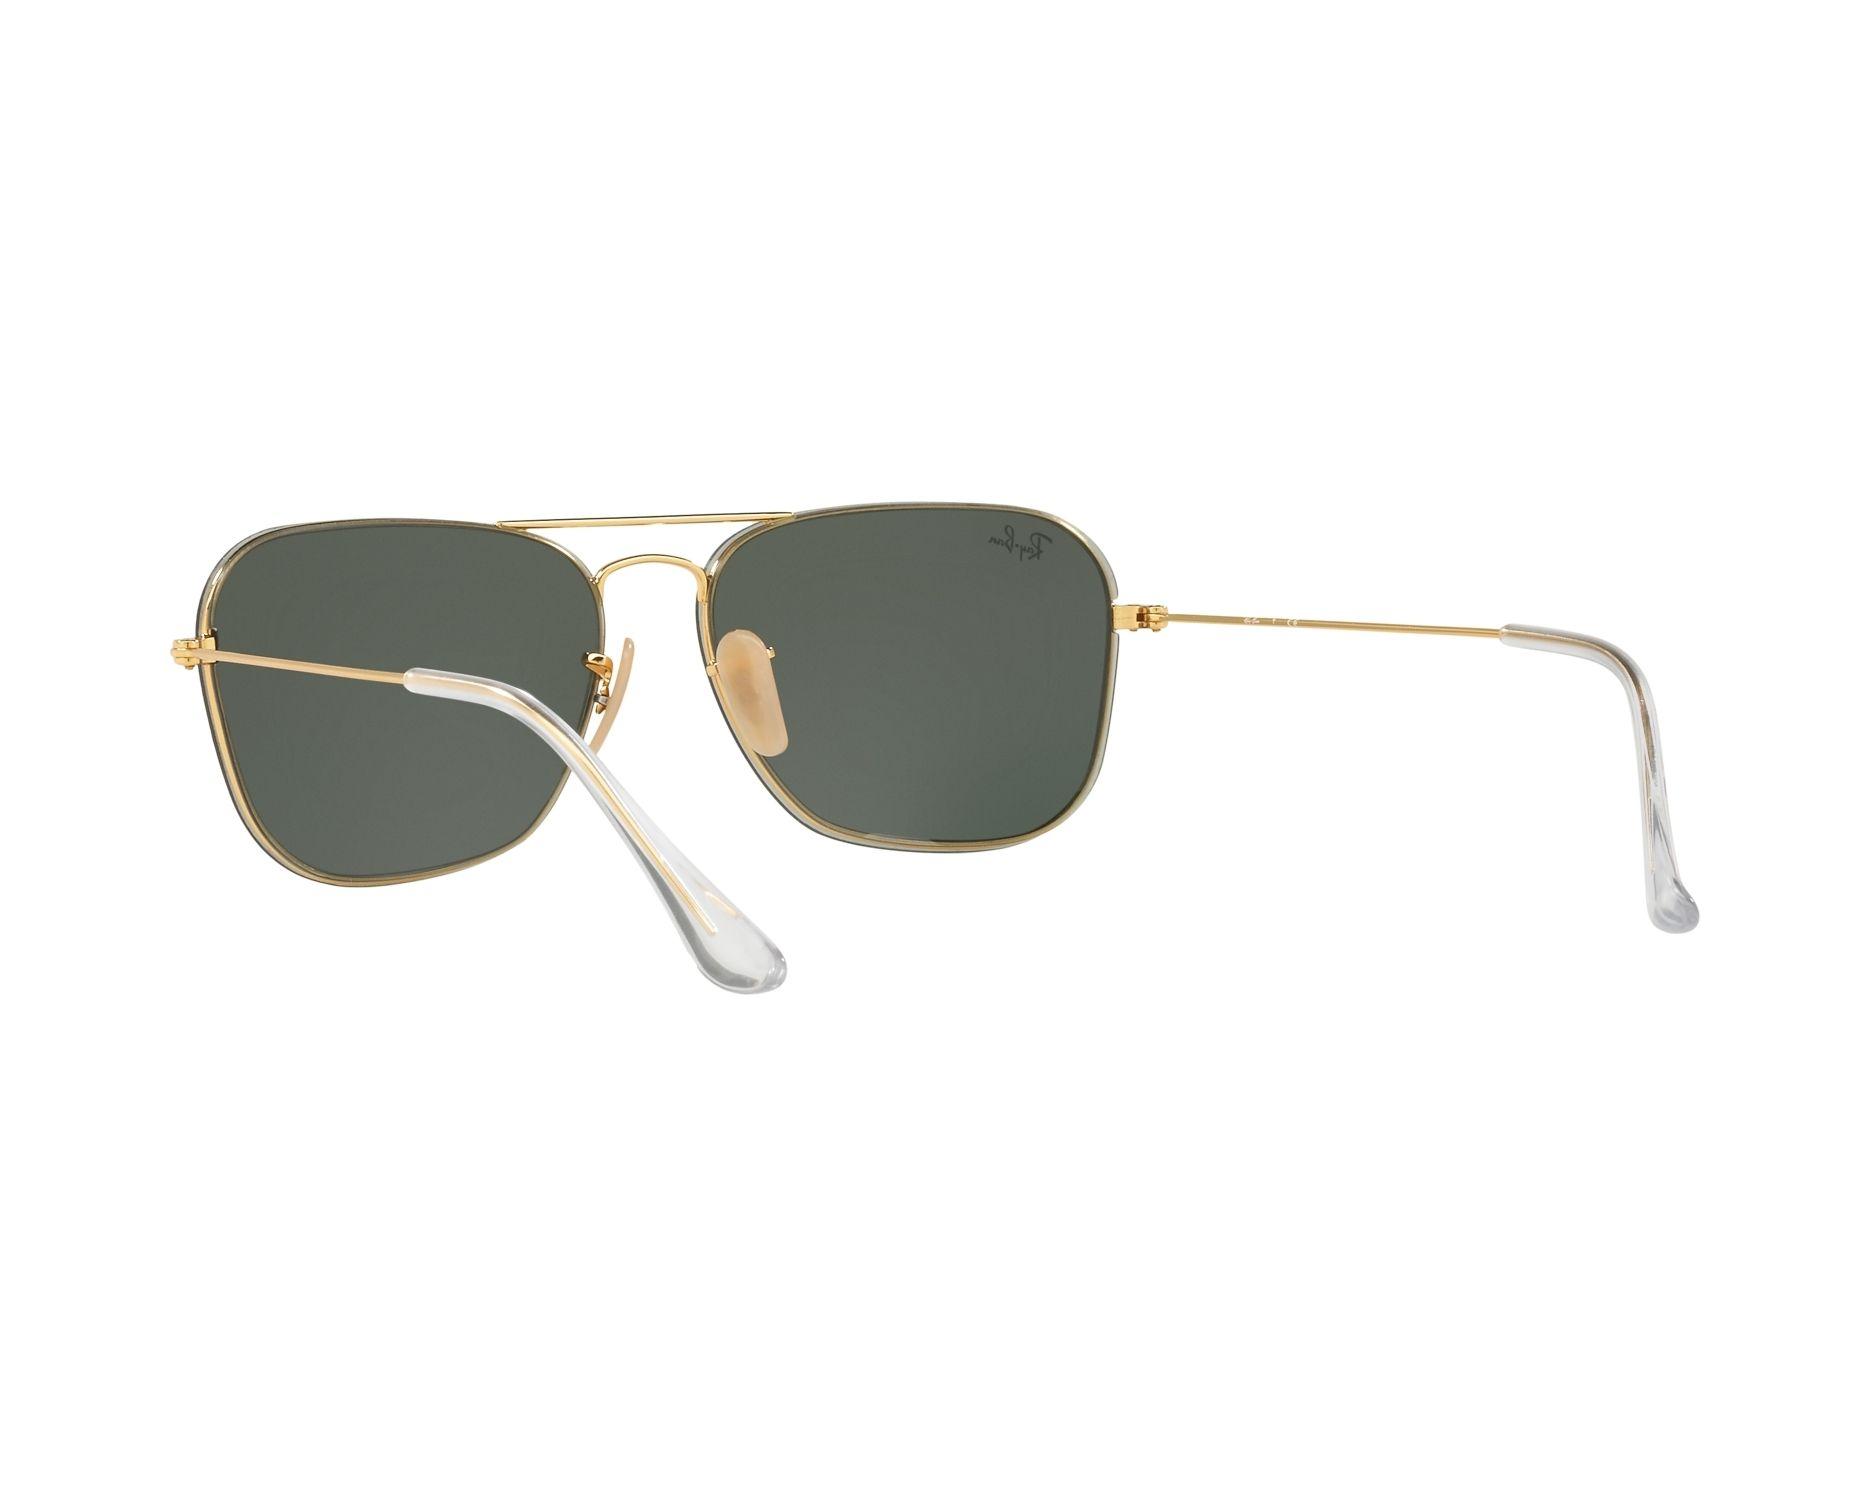 Ray-Ban RB3603 Sonnenbrille Gold 001/71 56mm Kg6z2l